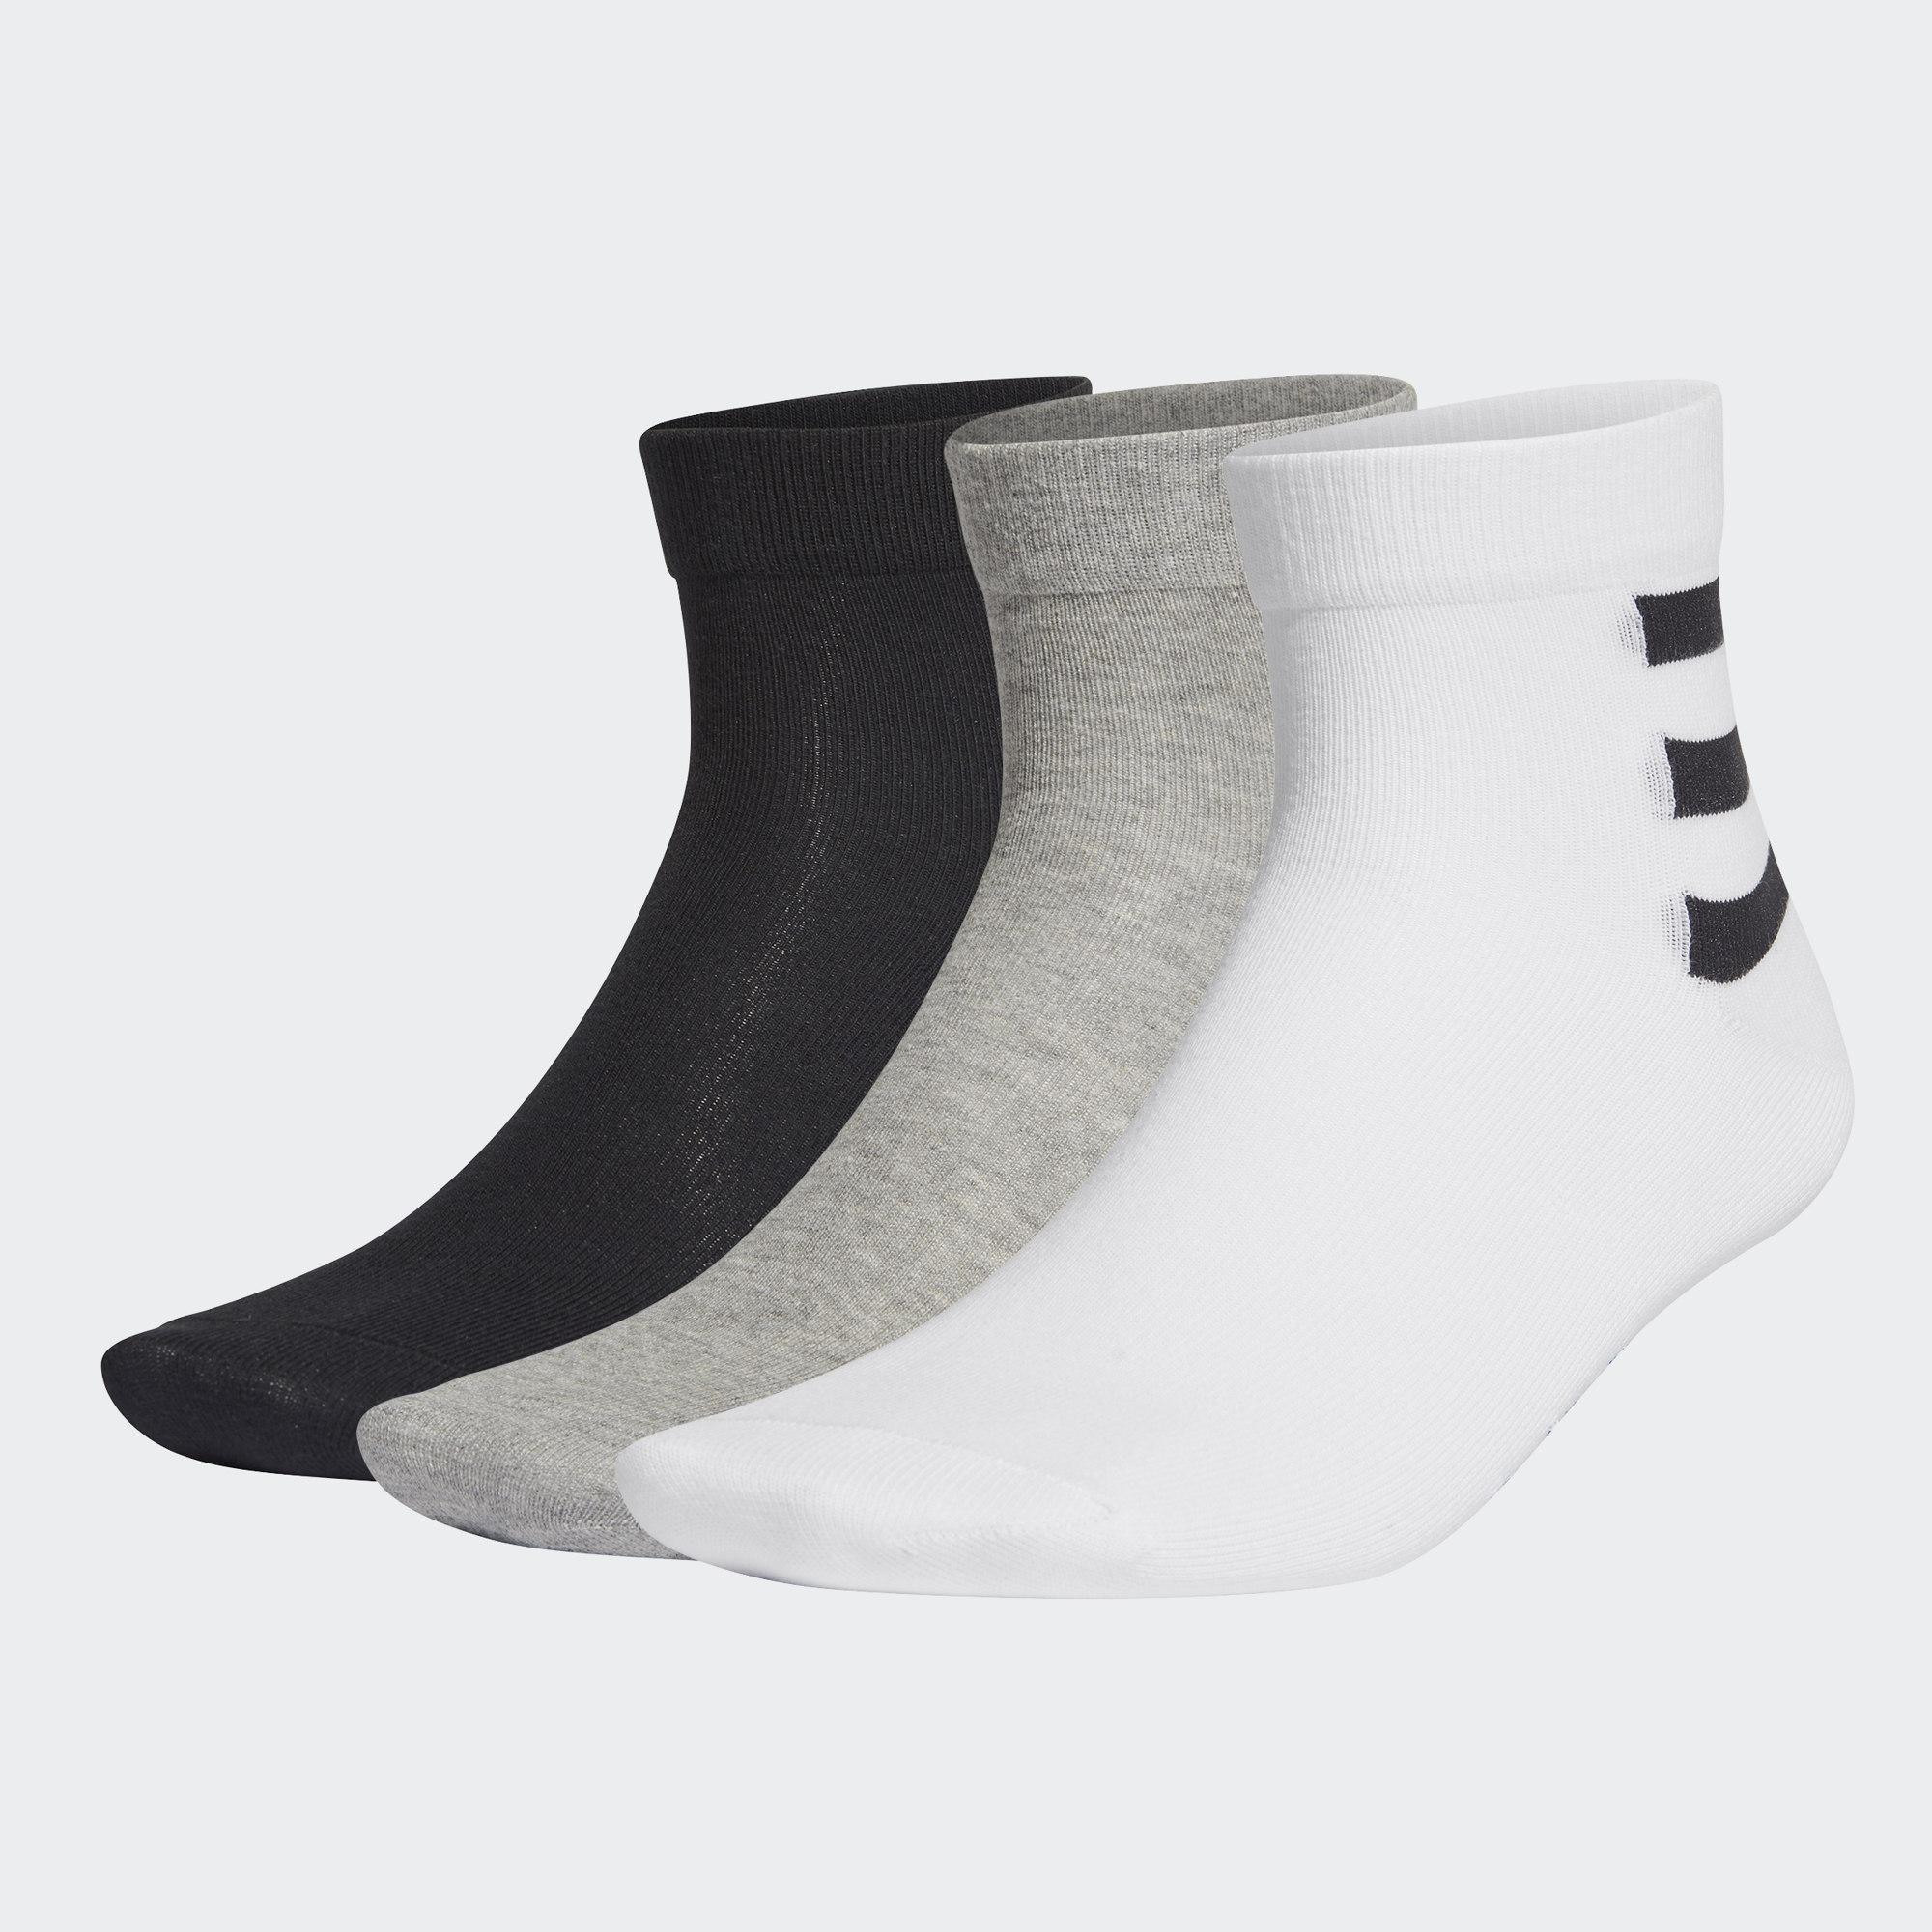 3-Stripes 腳踝襪 3 雙入